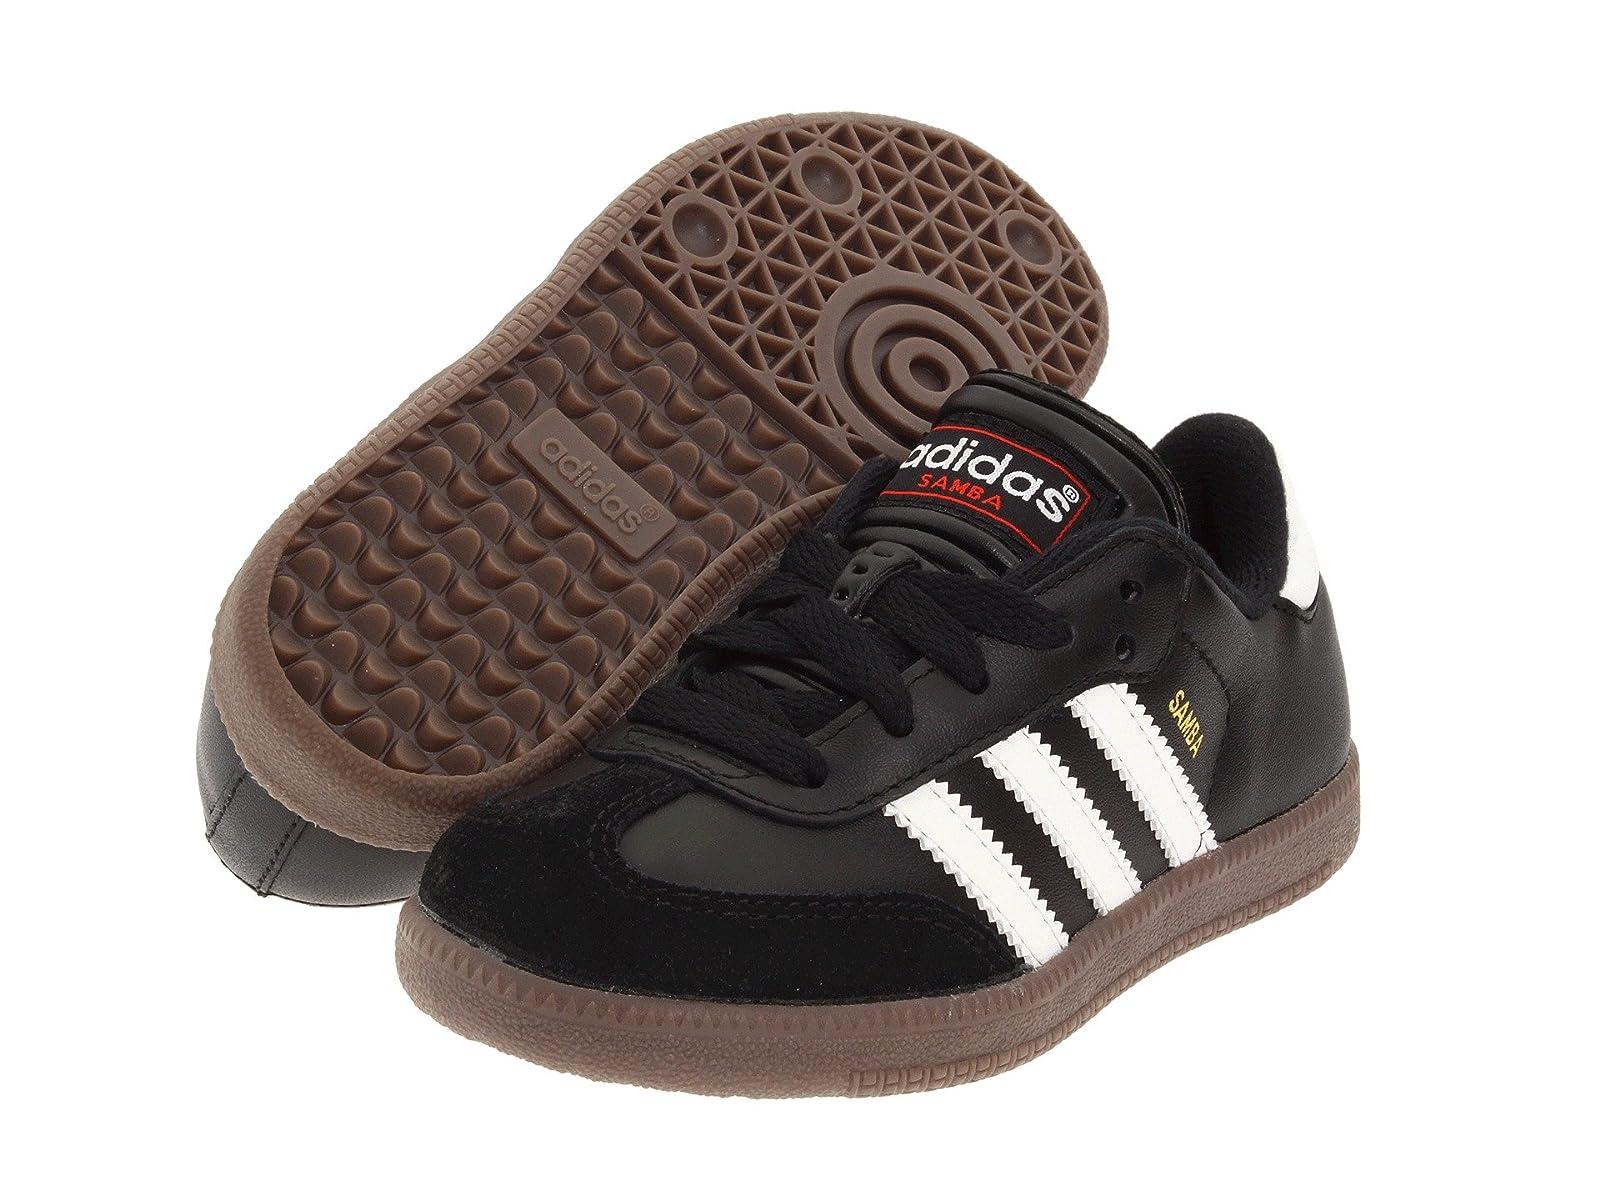 adidas enfants sambaclassic central (bébé (bébé (bébé / enfant / enfant) 6ed014